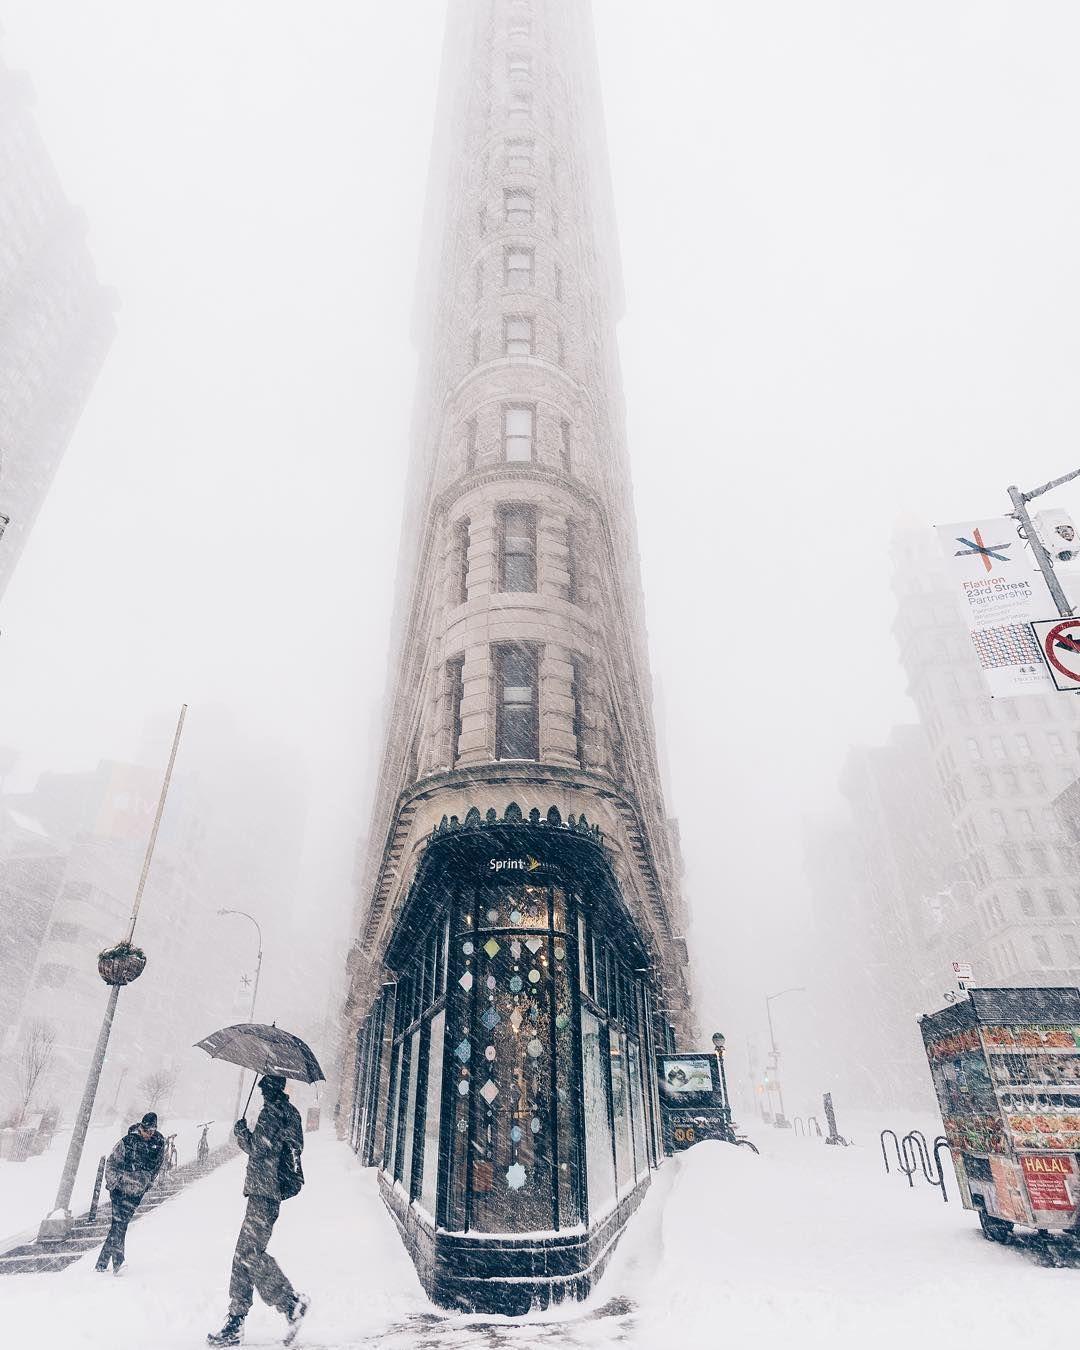 Flat In New York: The Historic Flatiron Building In New York City, New York